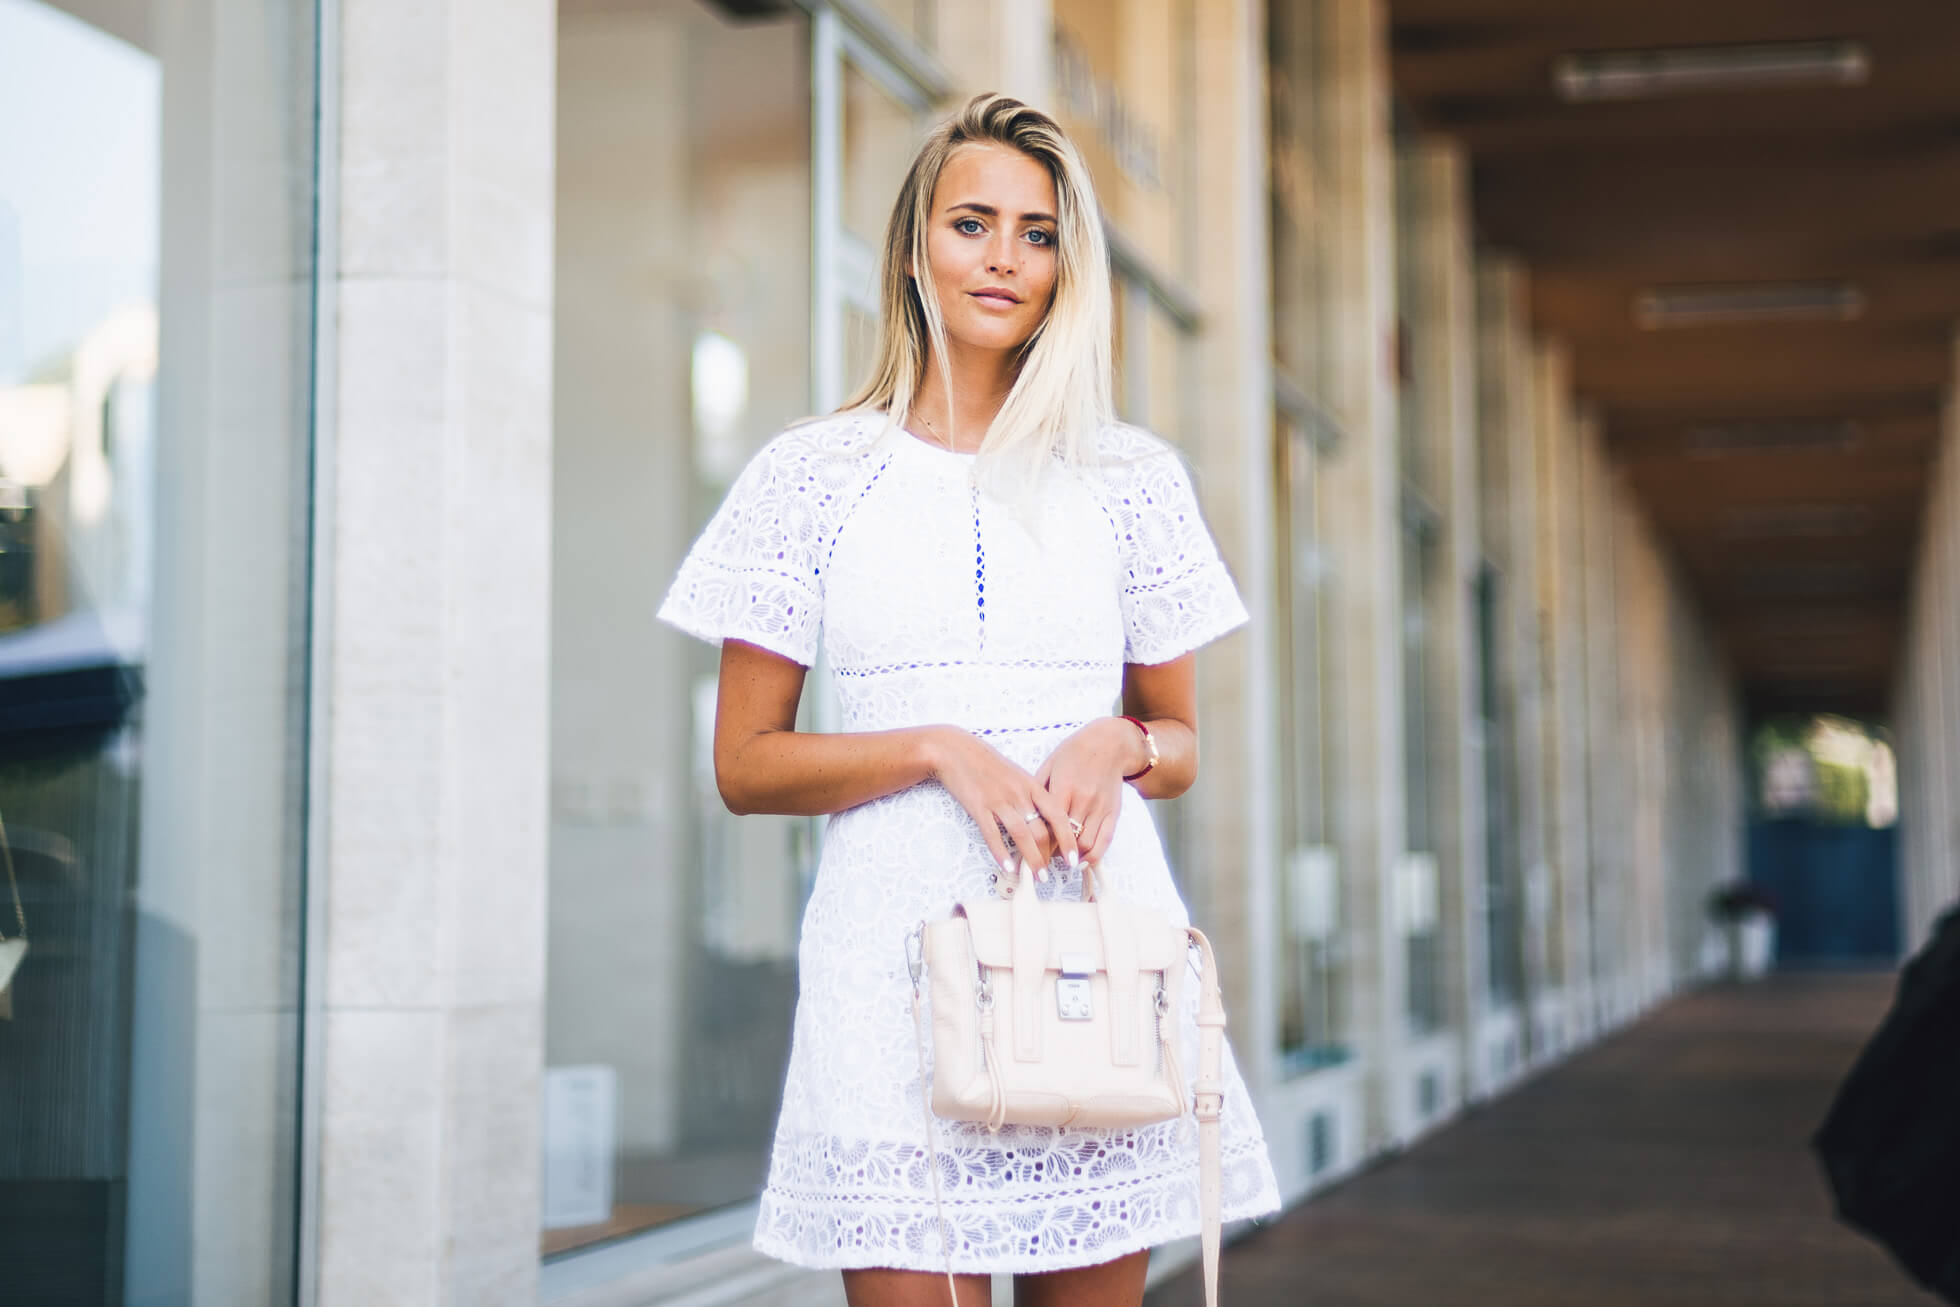 janni-deler-white-lace-dress-storetsJ1040090-Redigera